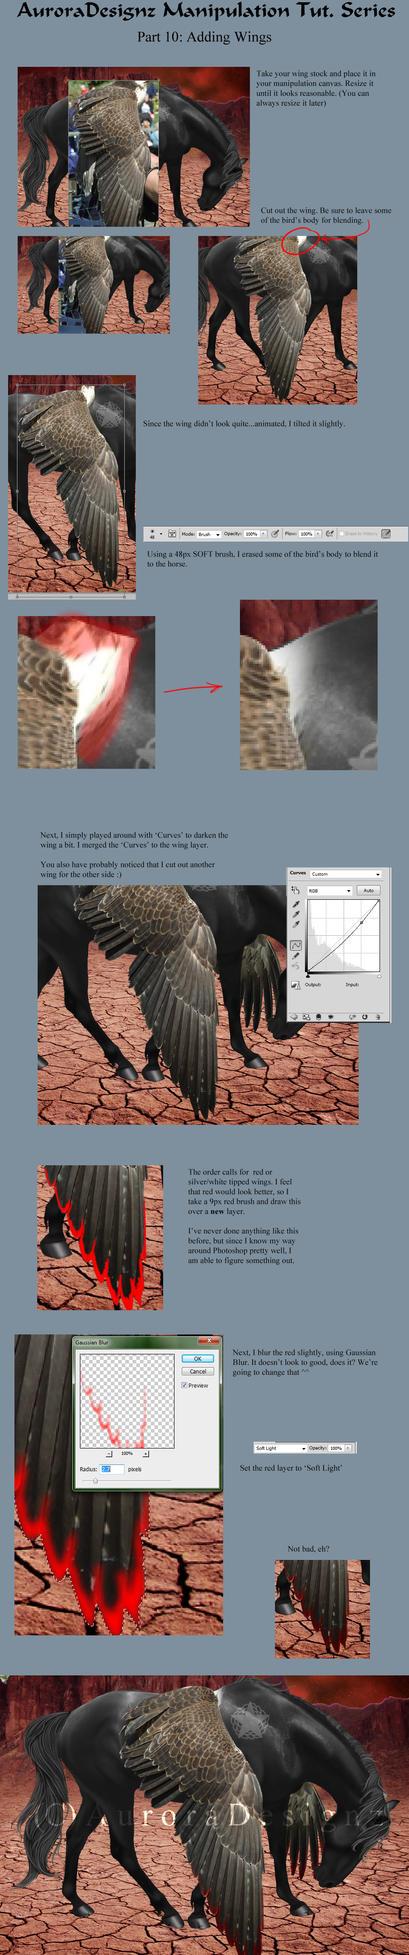 AuroraTutSeries Part 10: Adding Wings by xxAuroraStudios